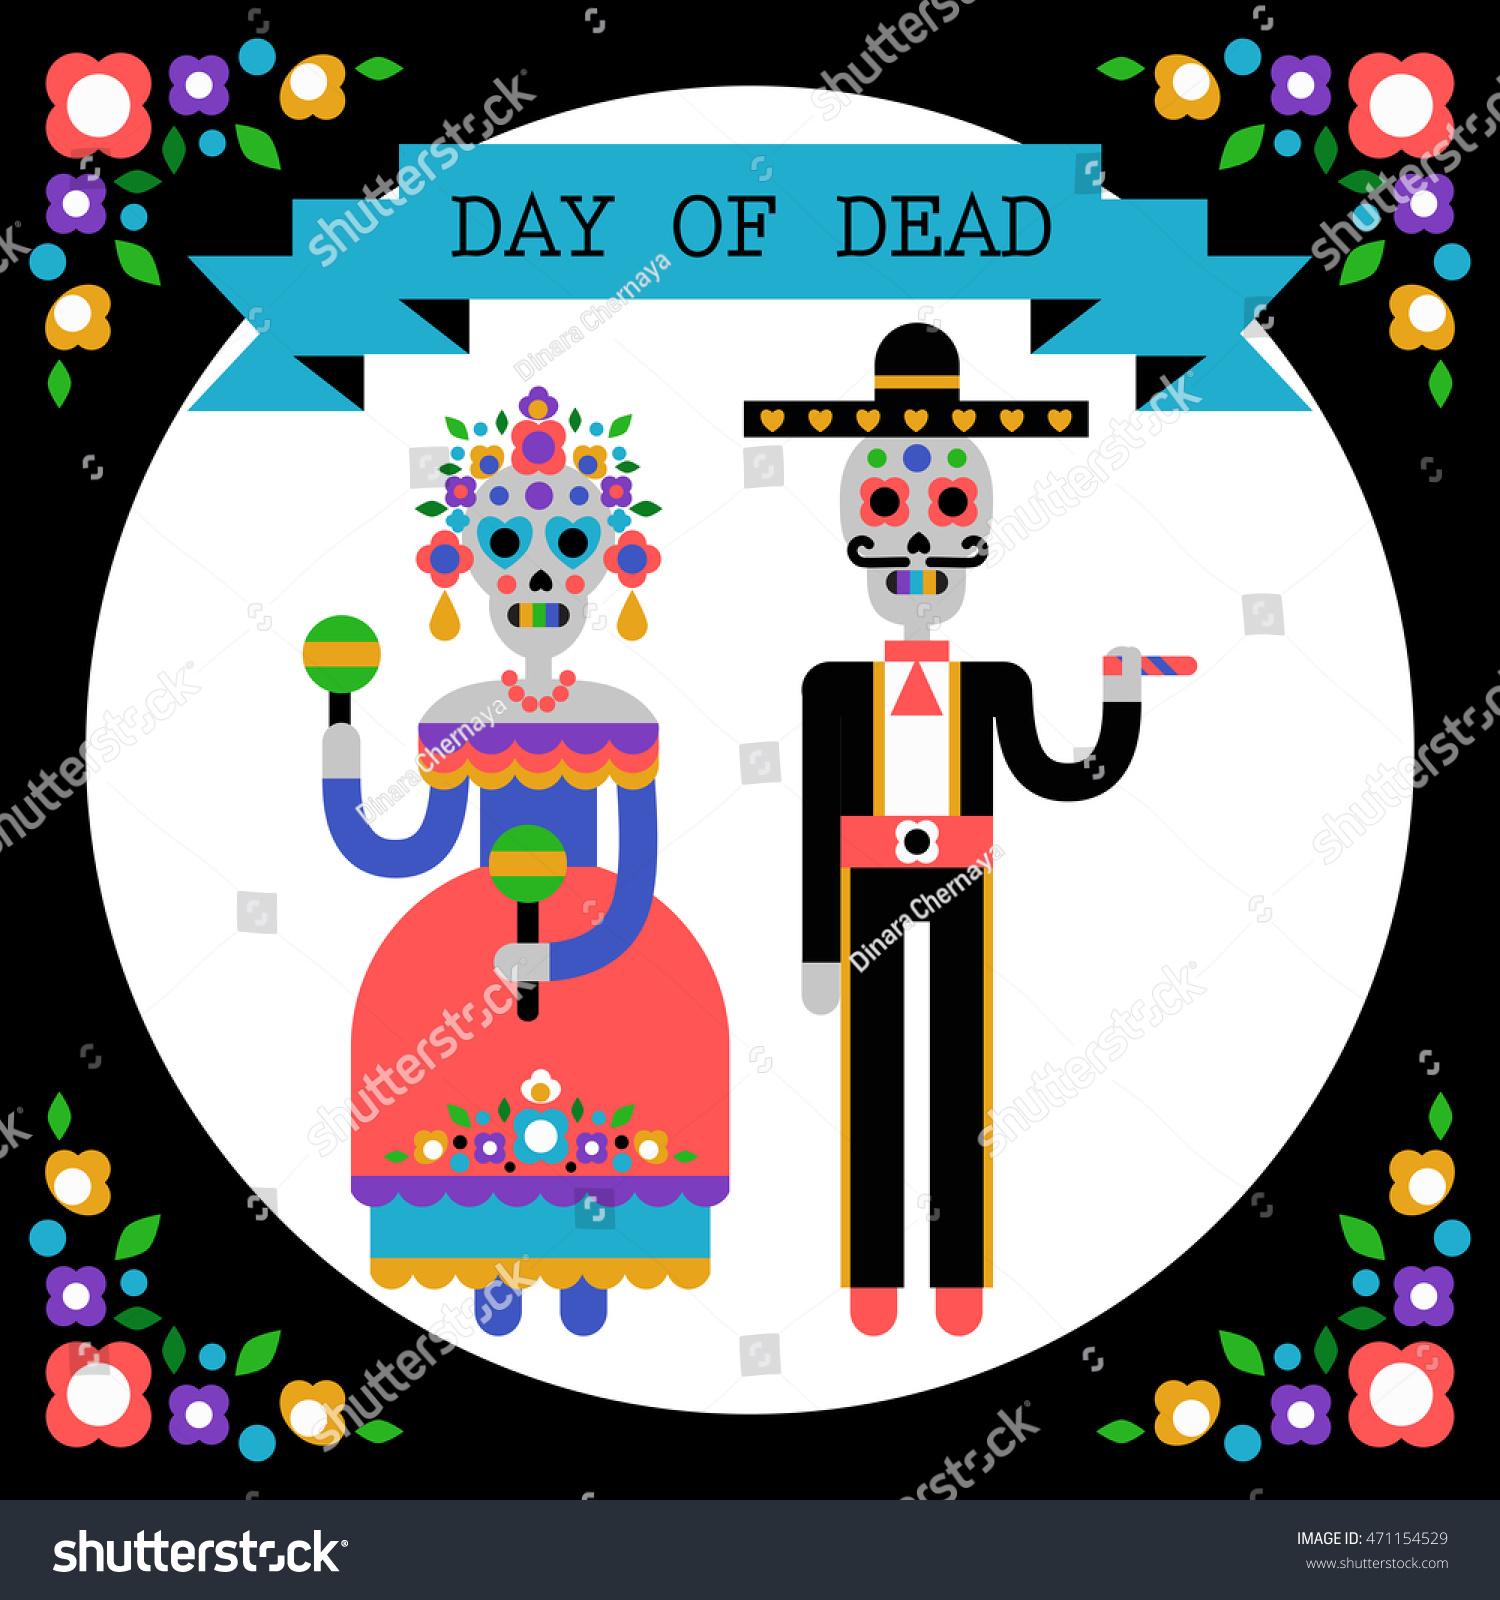 Day Of The Dead Dia De Los Muertos Vector Illustration Couple Skeletons